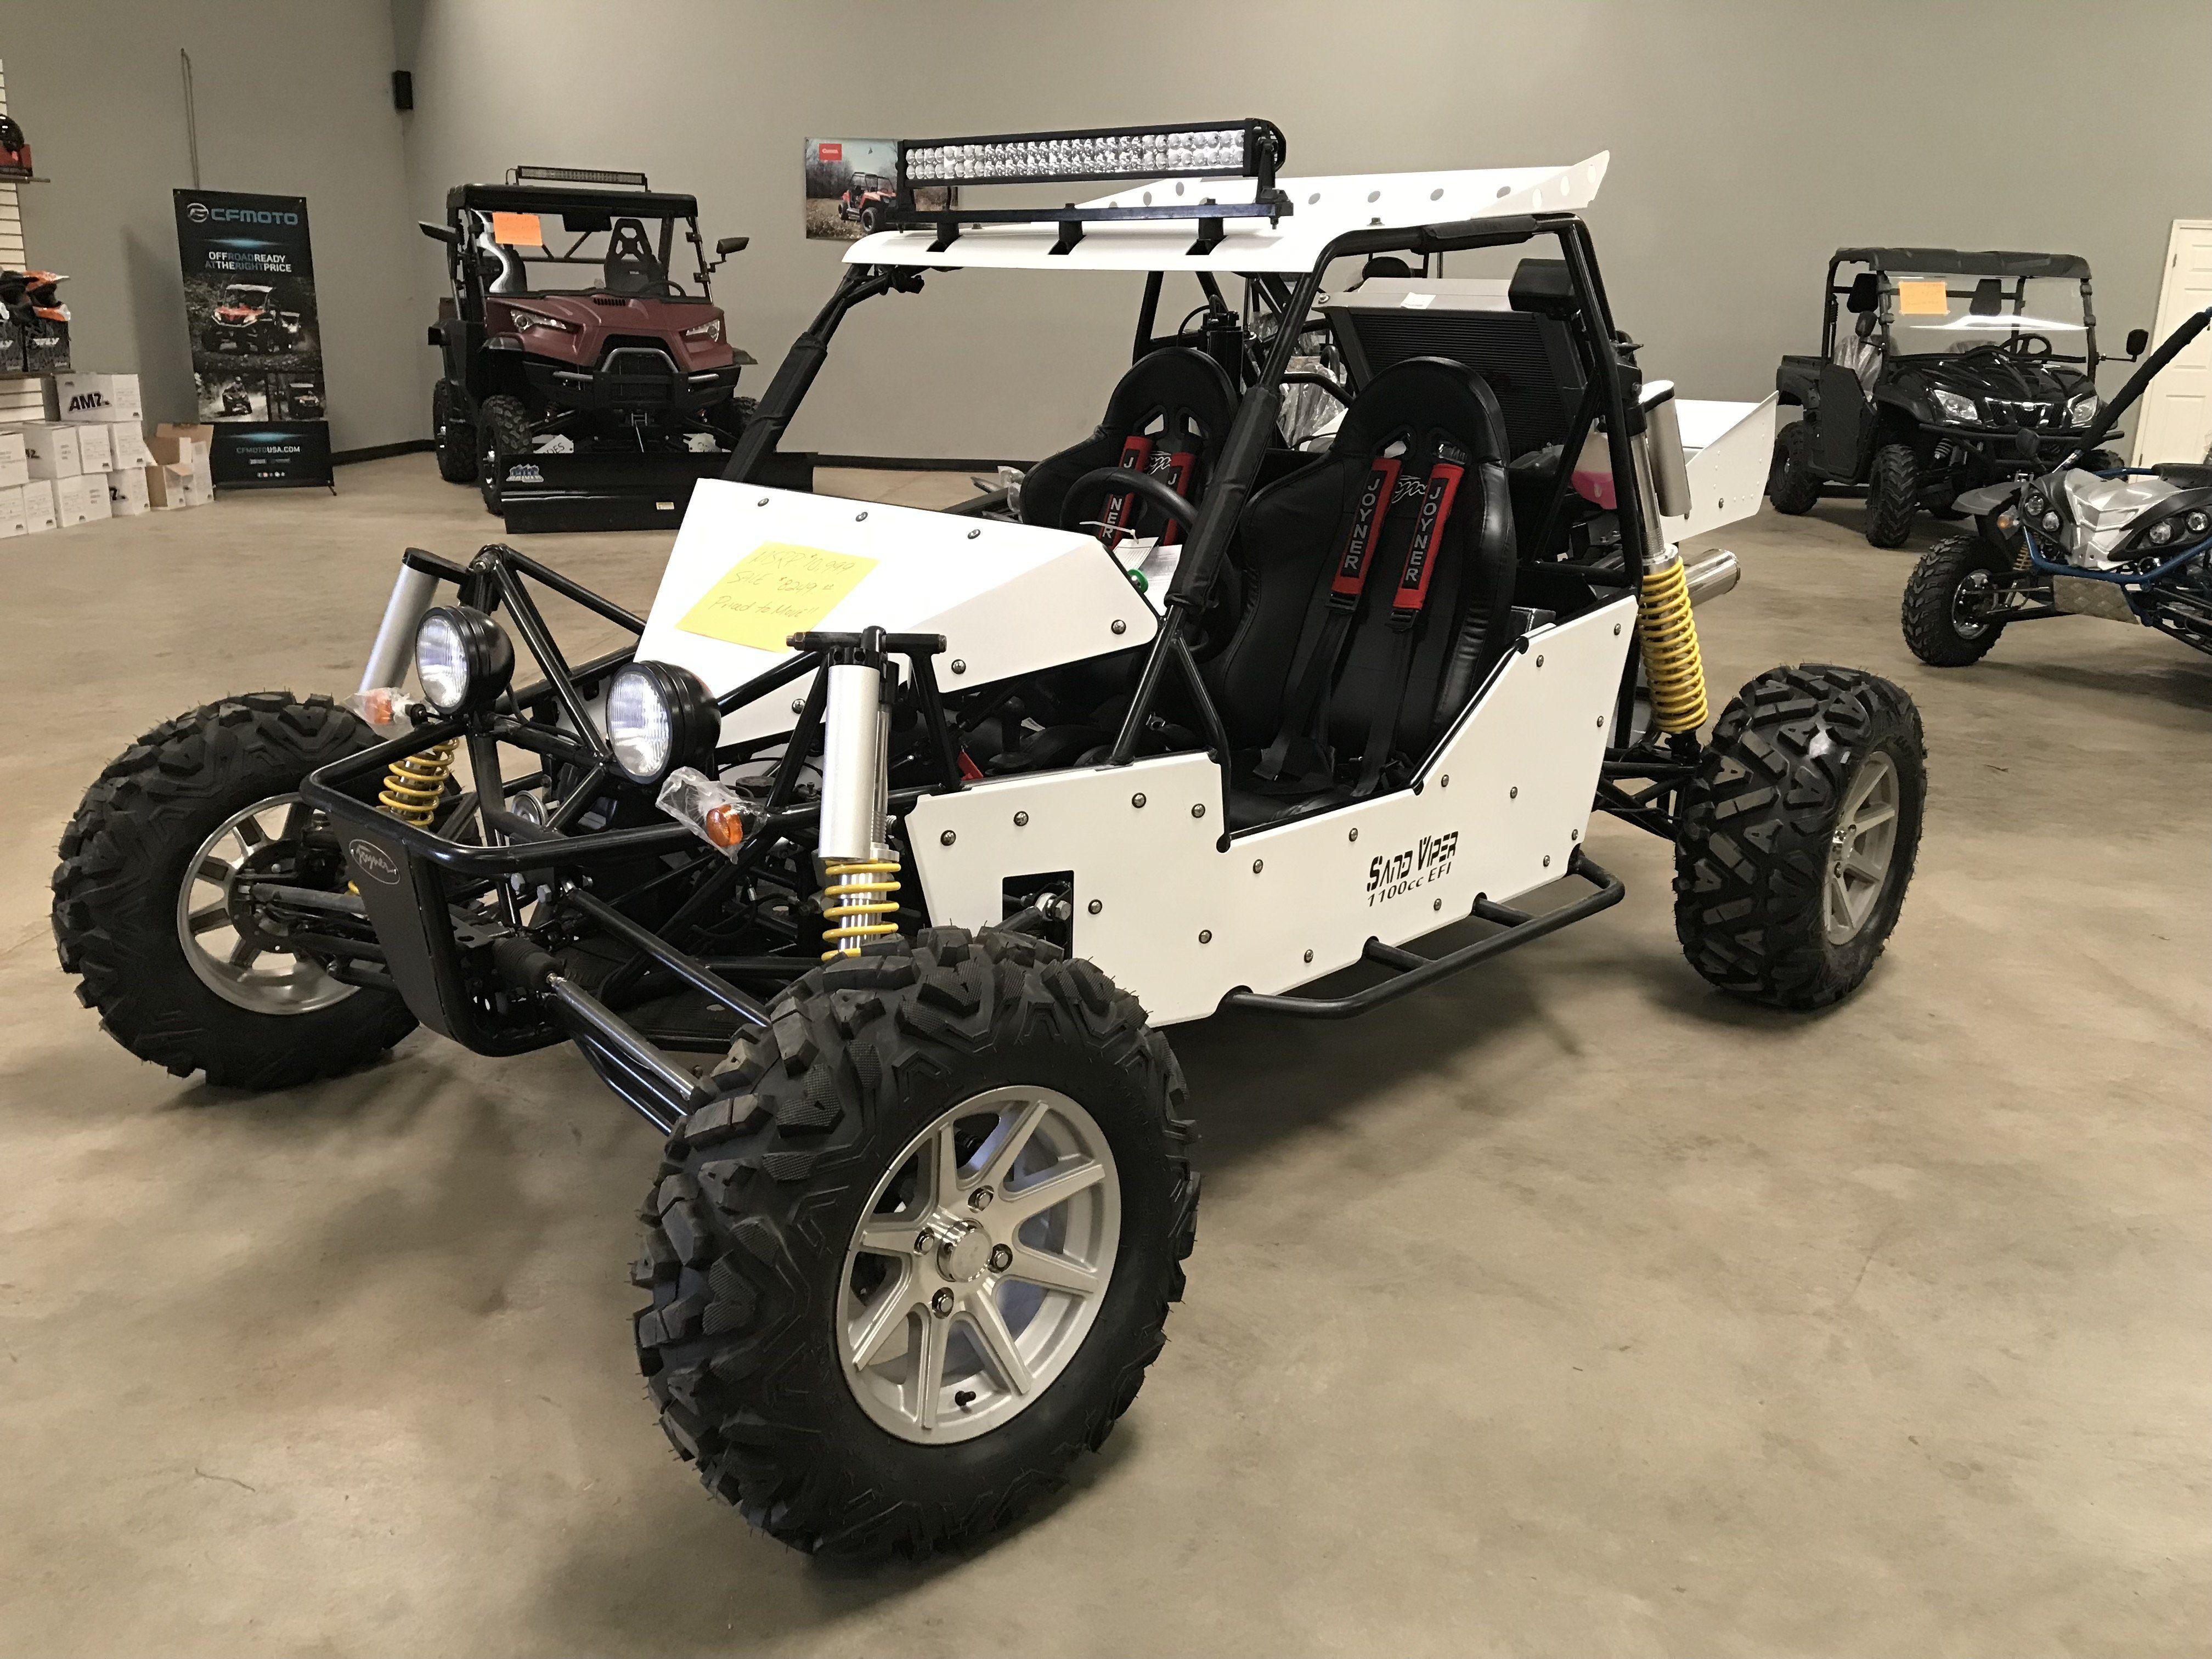 Joyner 1100cc Sand Viper- Street Legal - Dune Buggy DIY go